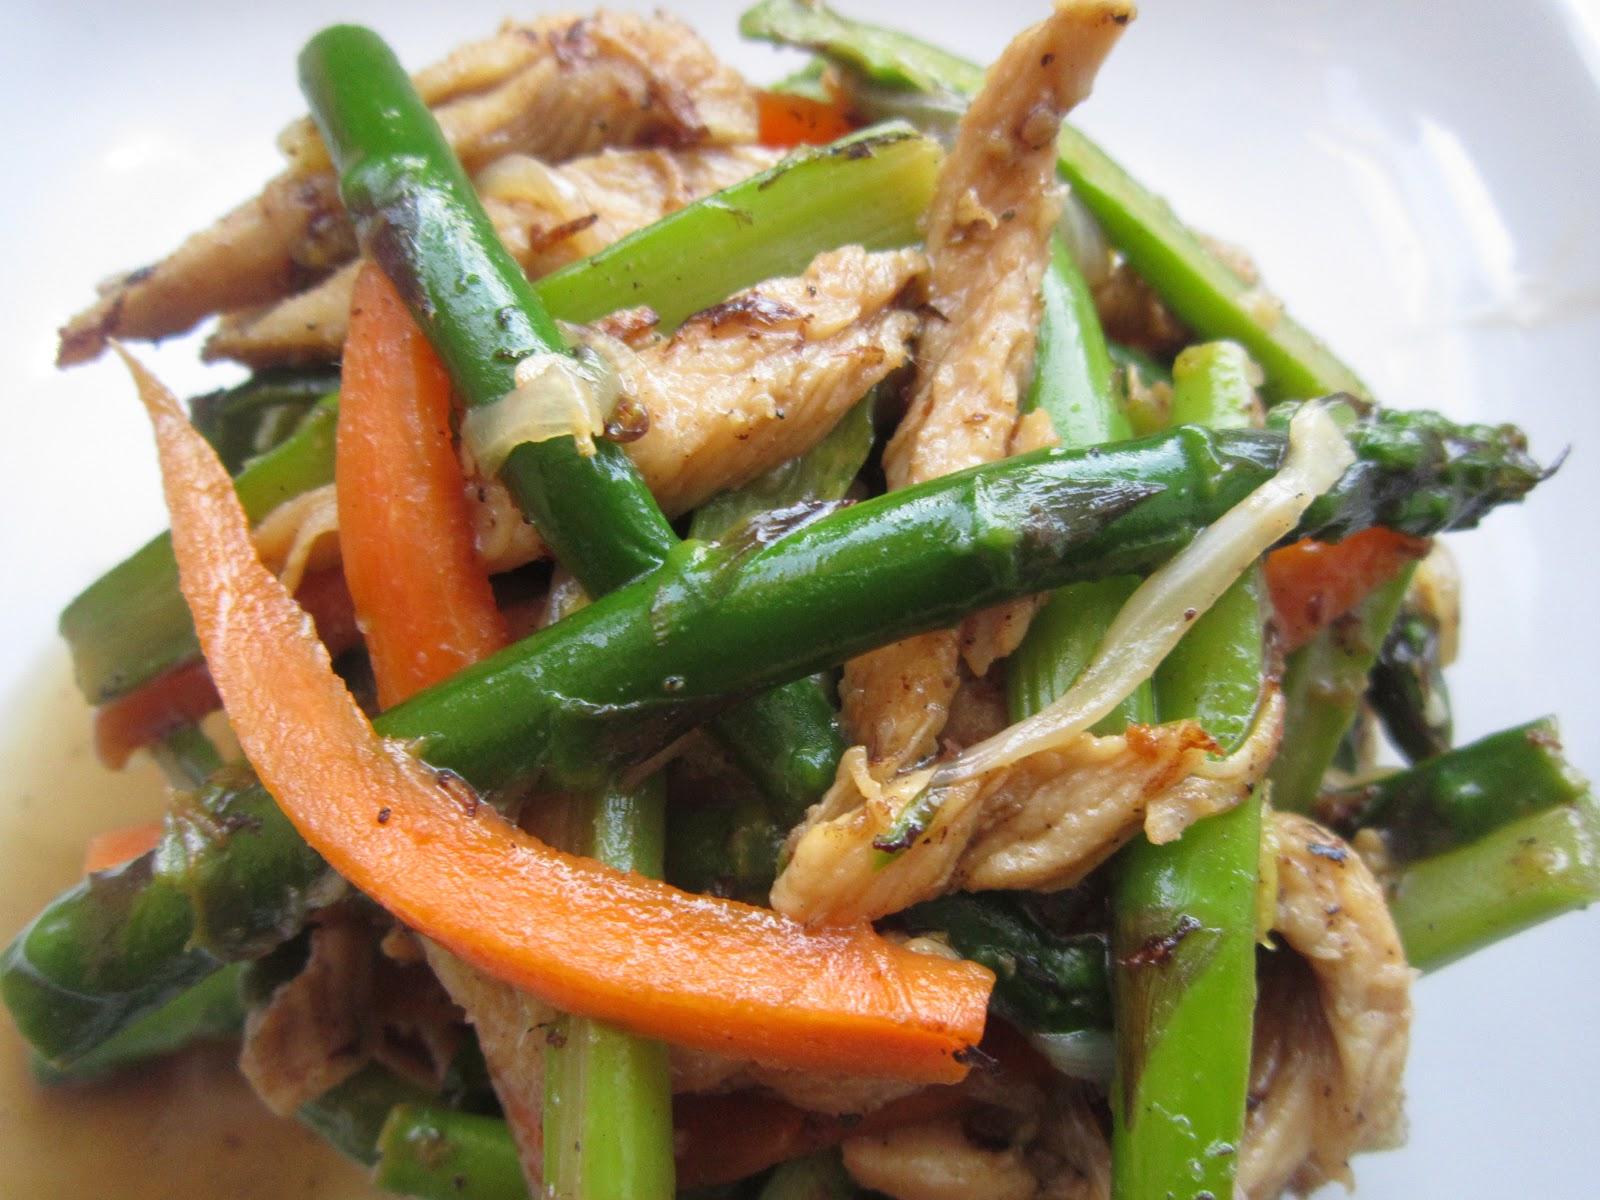 Esp rragos salteados con pollo y zanahoria recetas de cocina - Comidas con esparragos ...